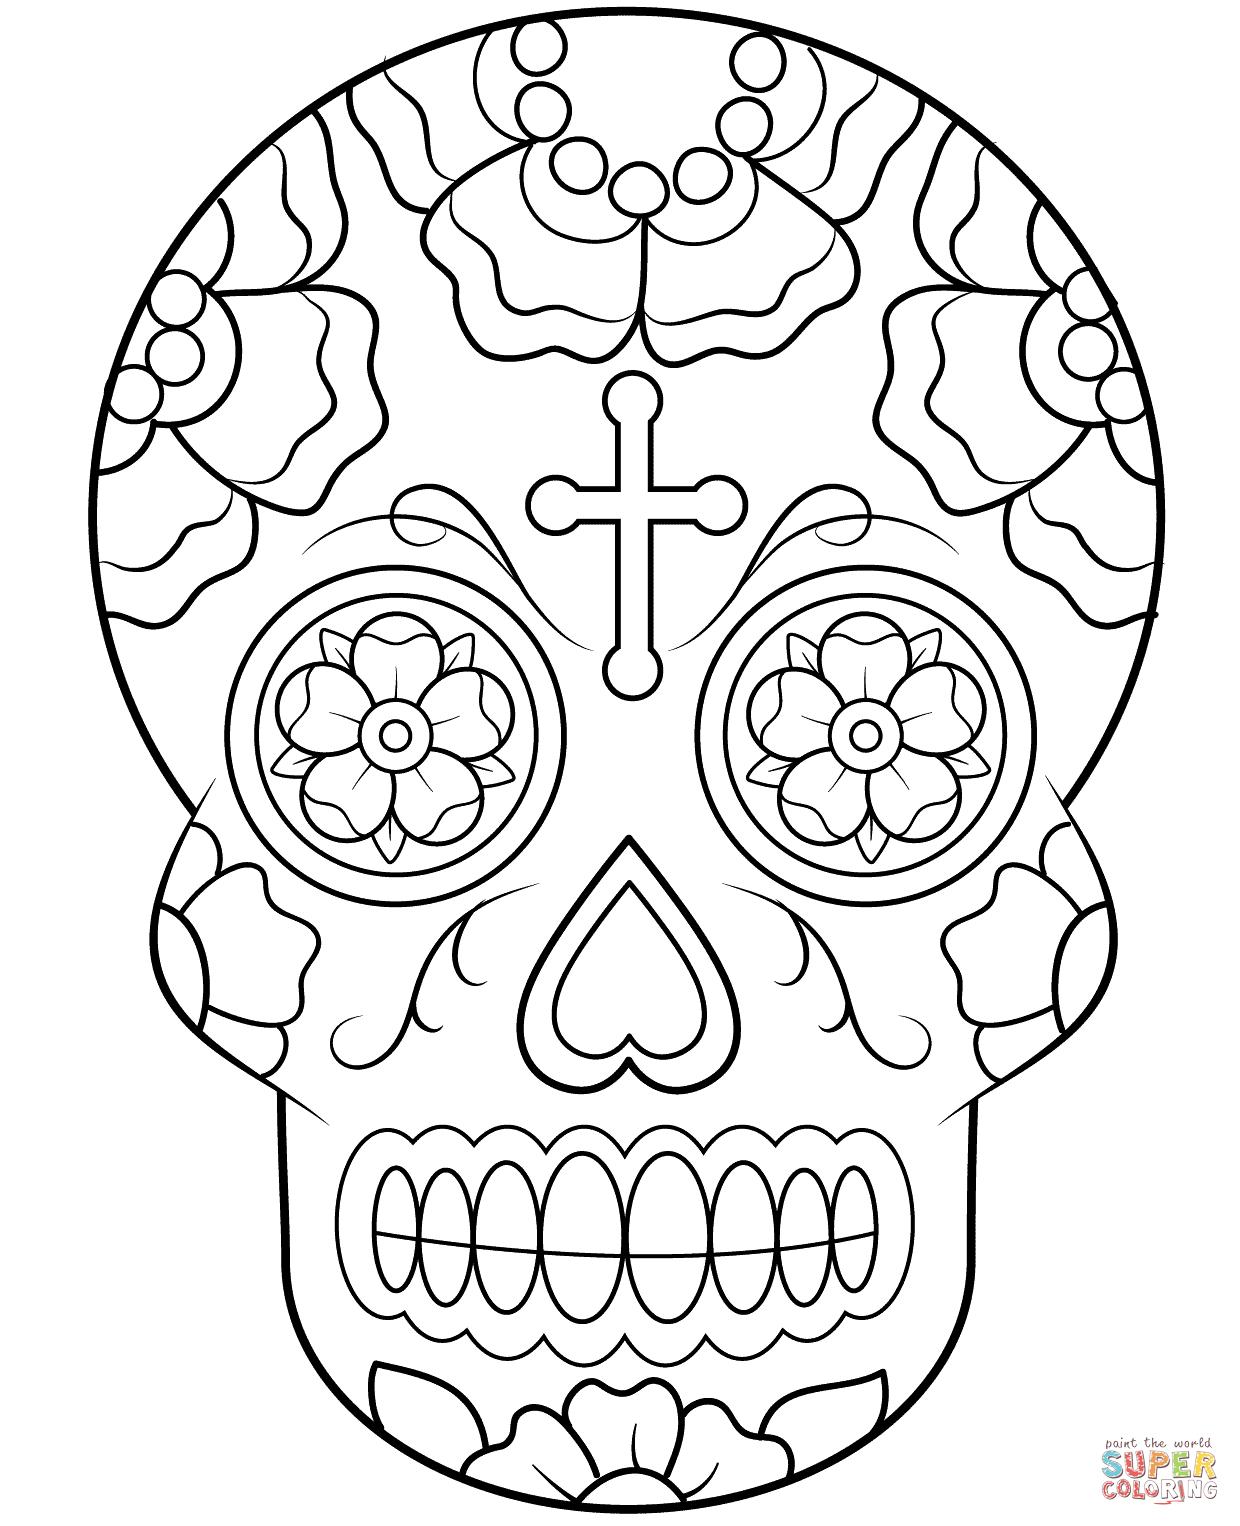 1240x1526 Download Image Clip Simple Sugar Skull. Pin Drawn Skull Mexican